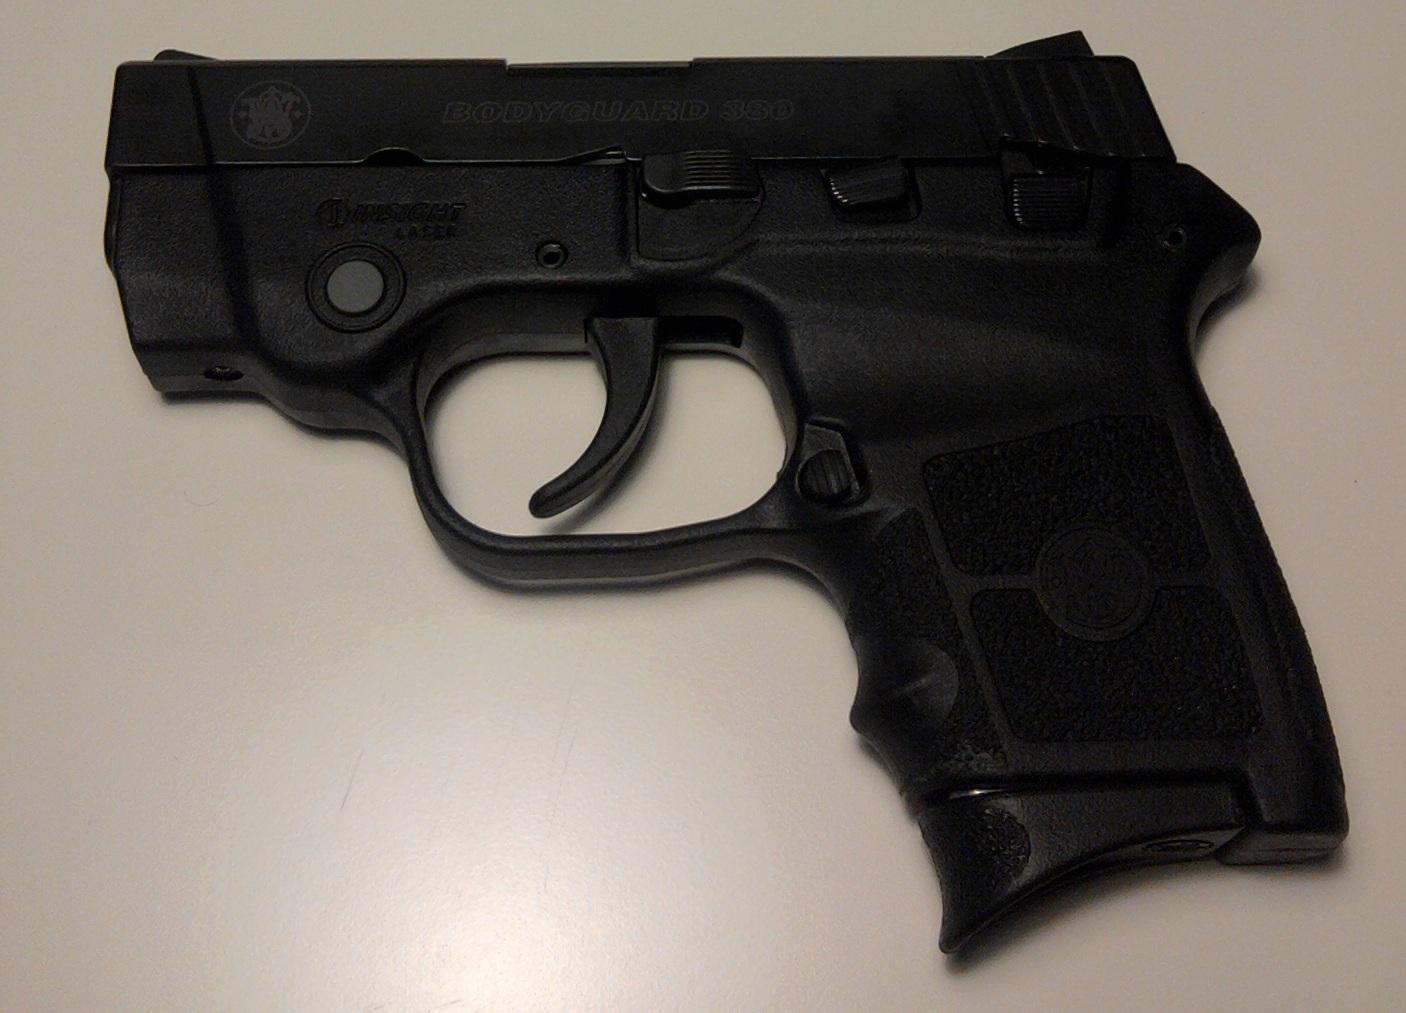 Smith & Wesson Bodyguard 380 - Wikipedia